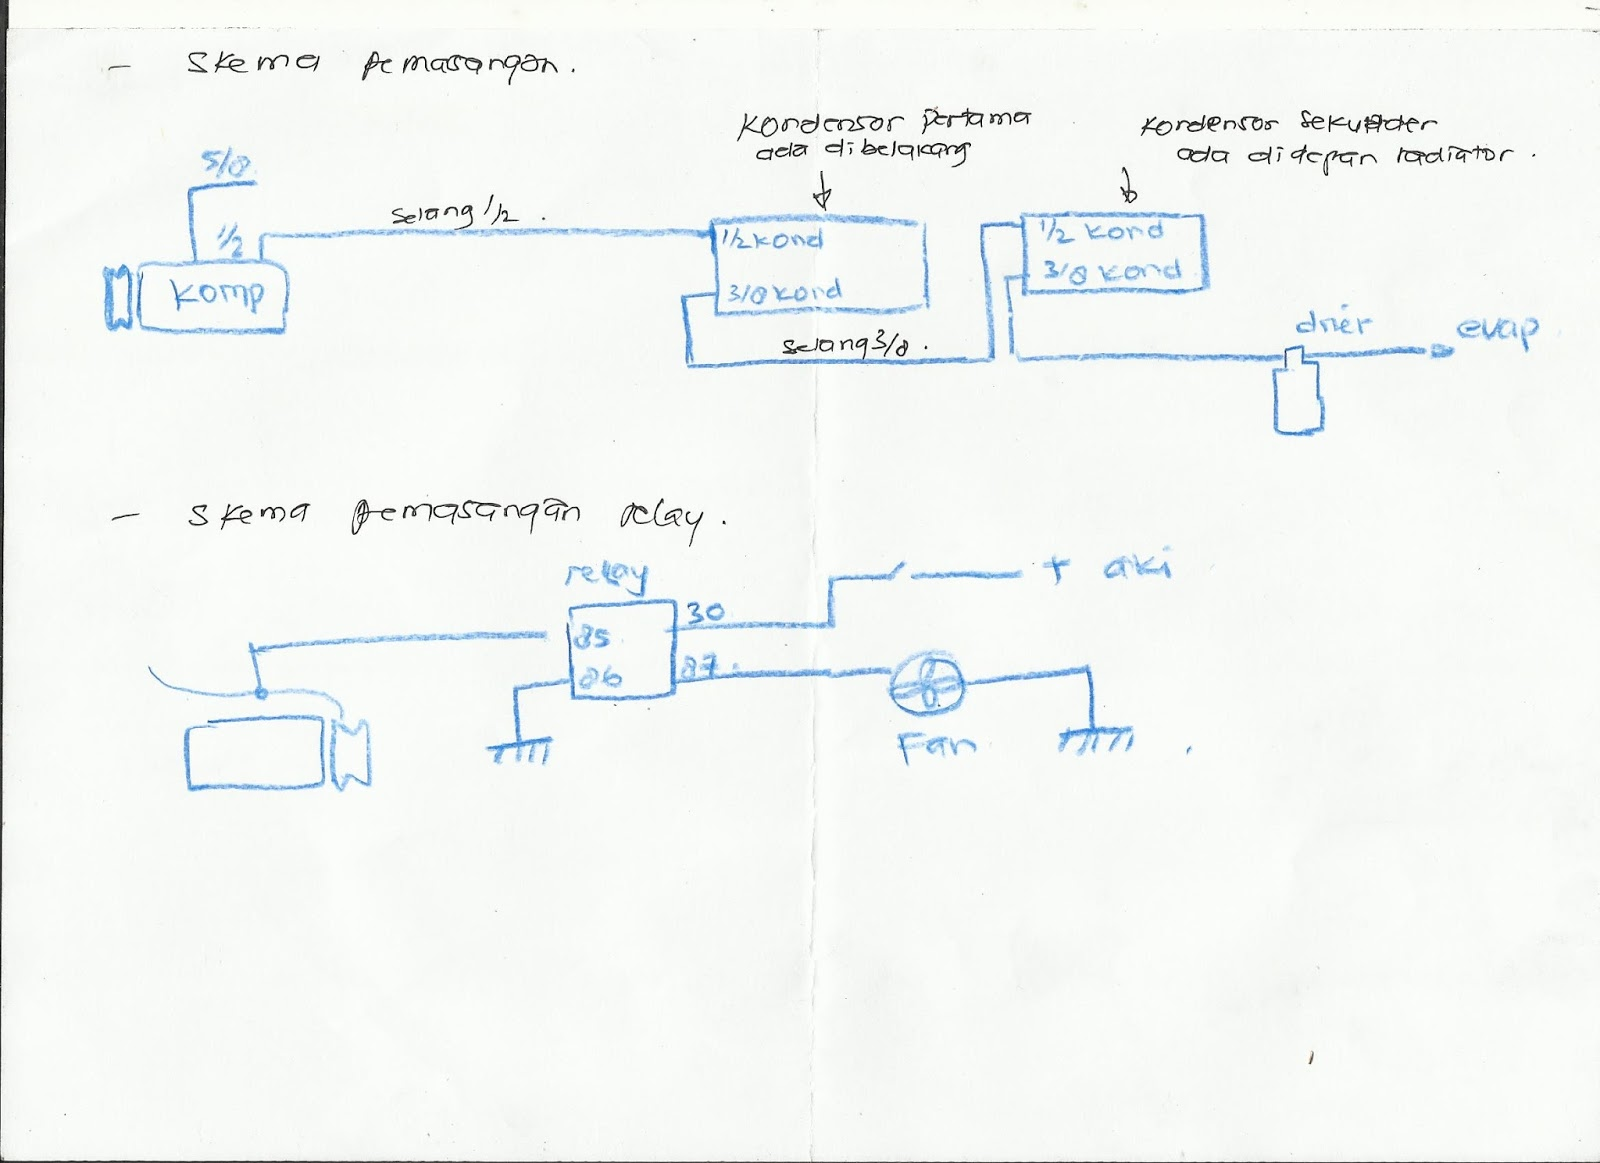 medium resolution of rangkaian wiring sederhana dan pengukurannya